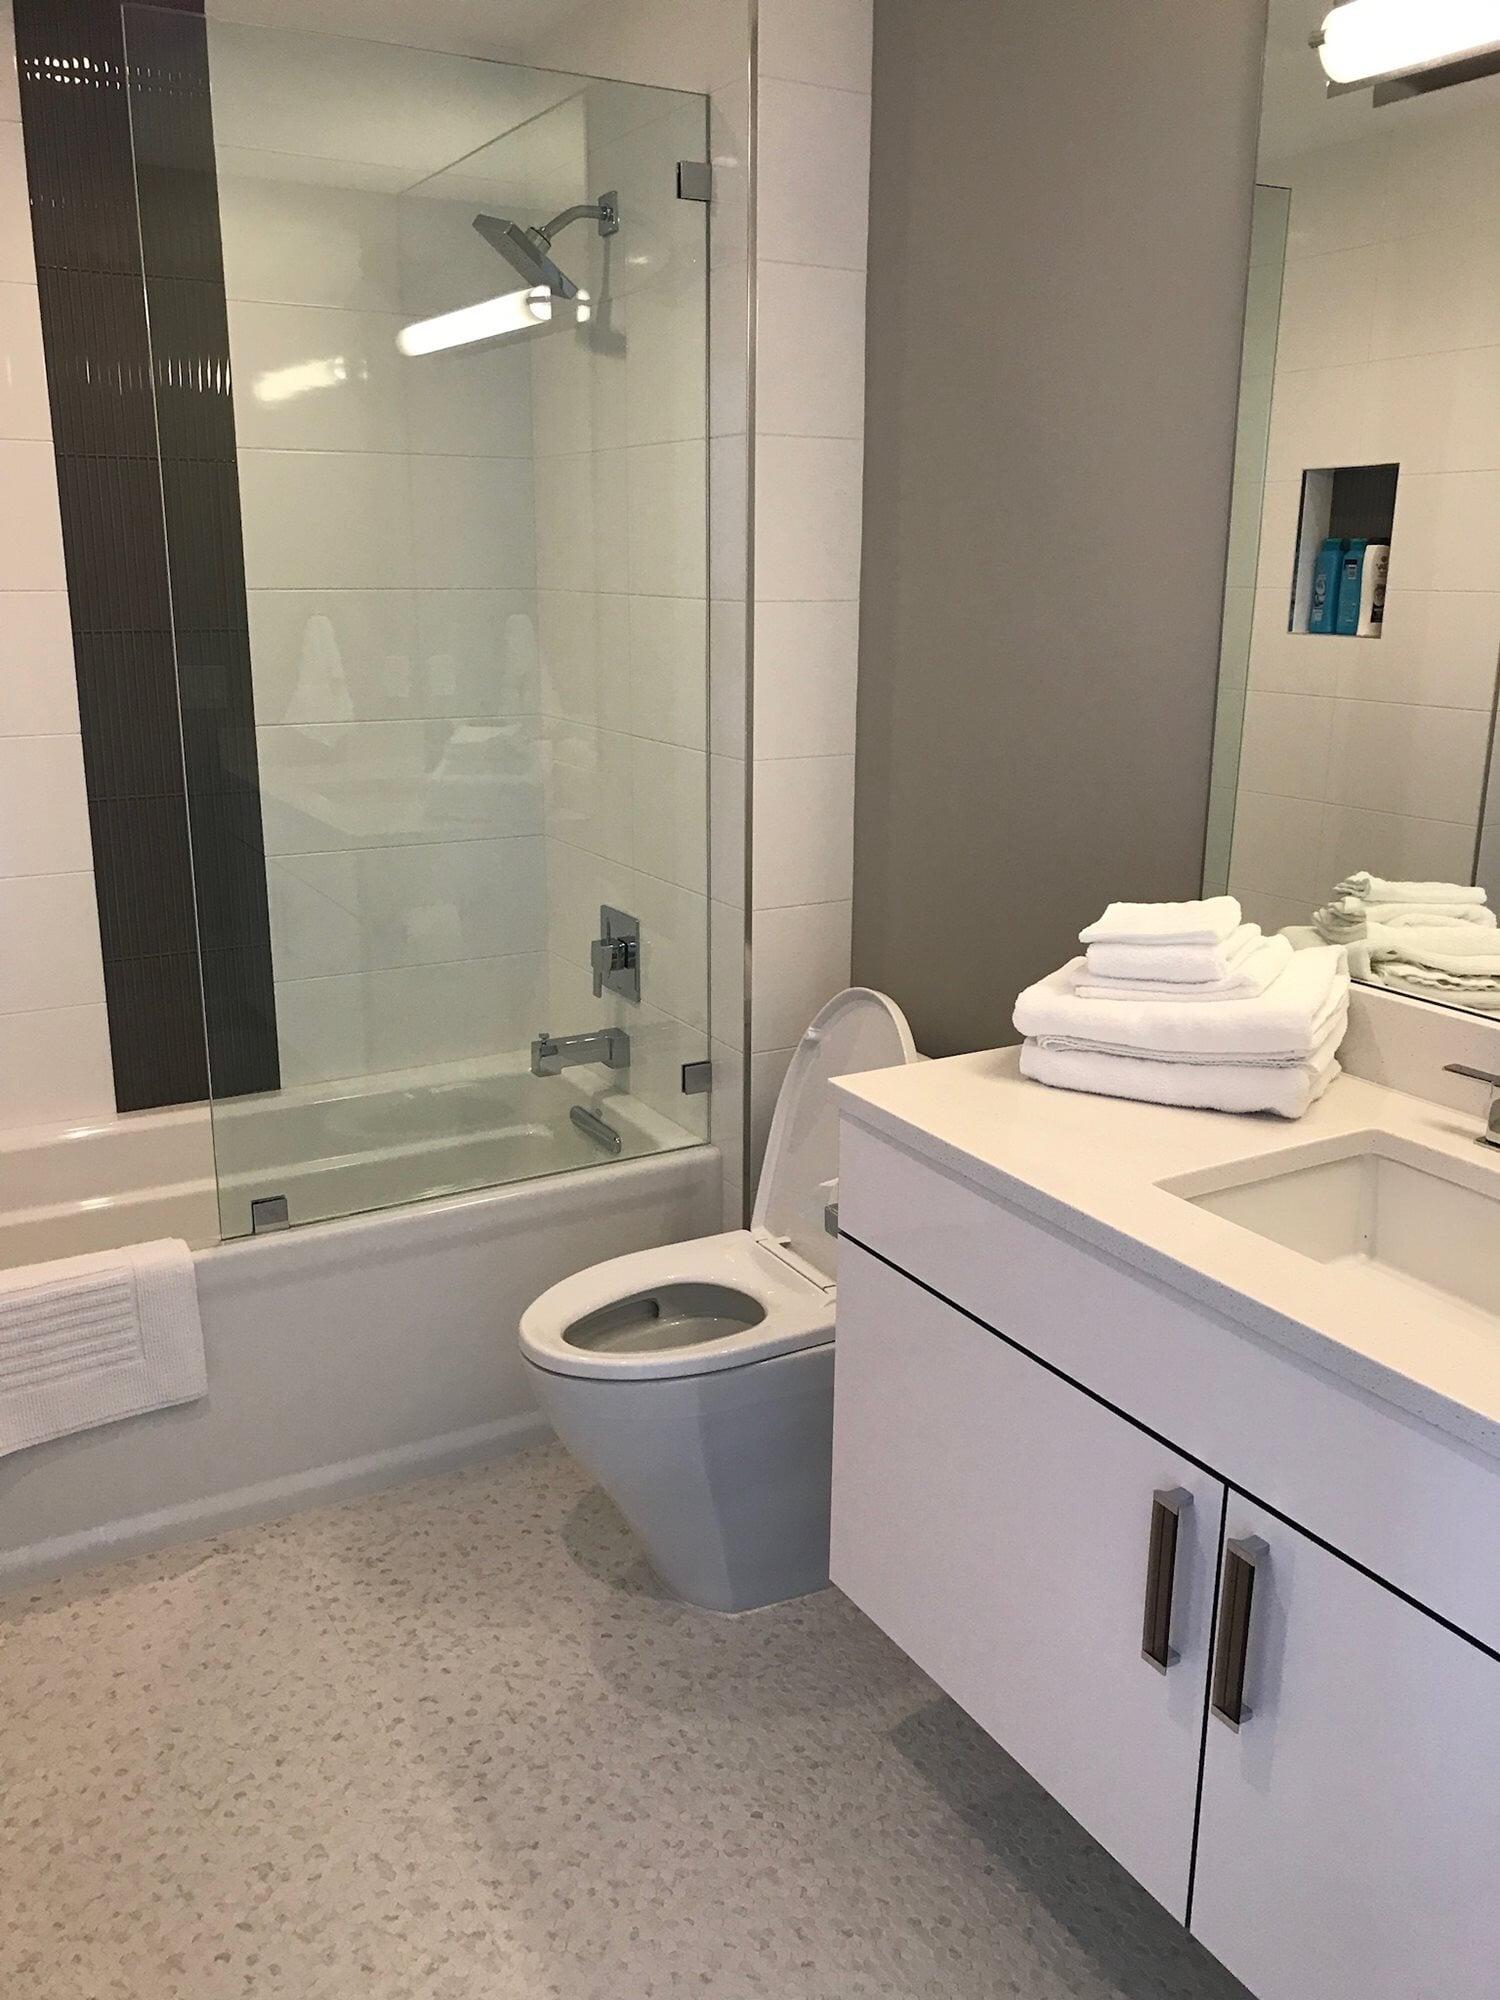 Modern bathroom design in Juno Beach, FL from Floors For You Kitchen & Bath